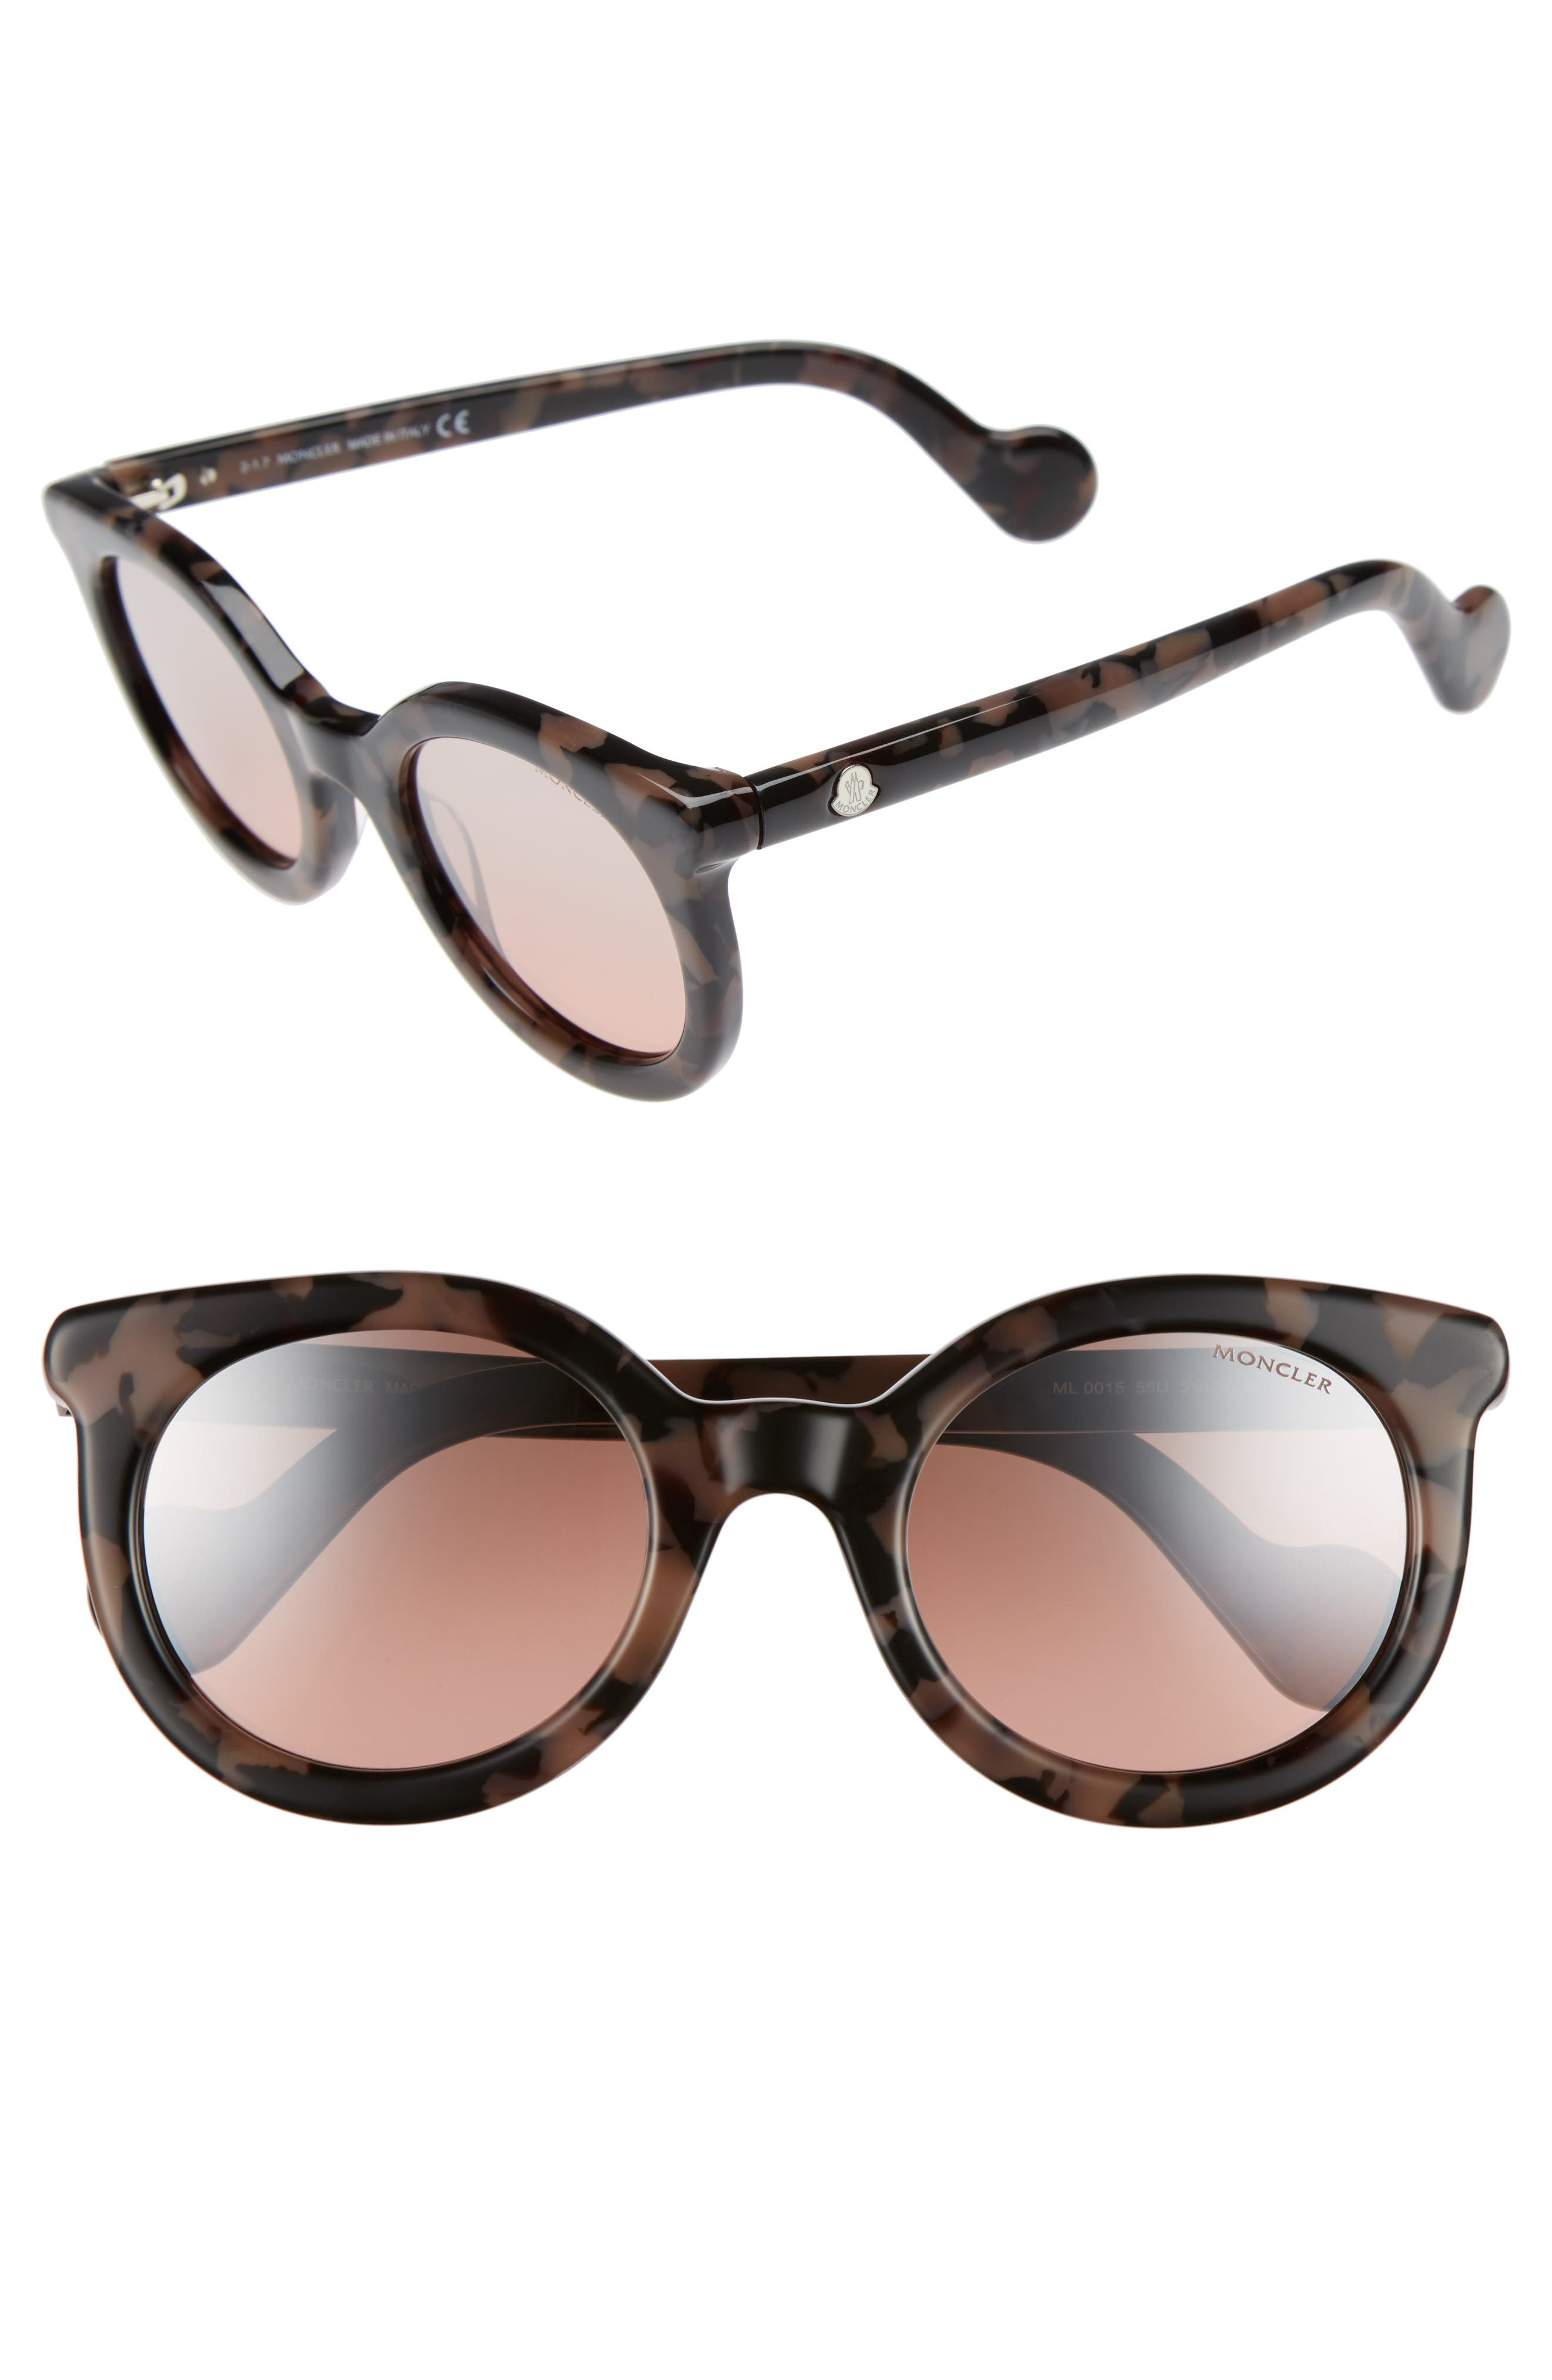 51mm Sunglasses,                             Main thumbnail 1, color,                             Havana / Bordeaux Mirror